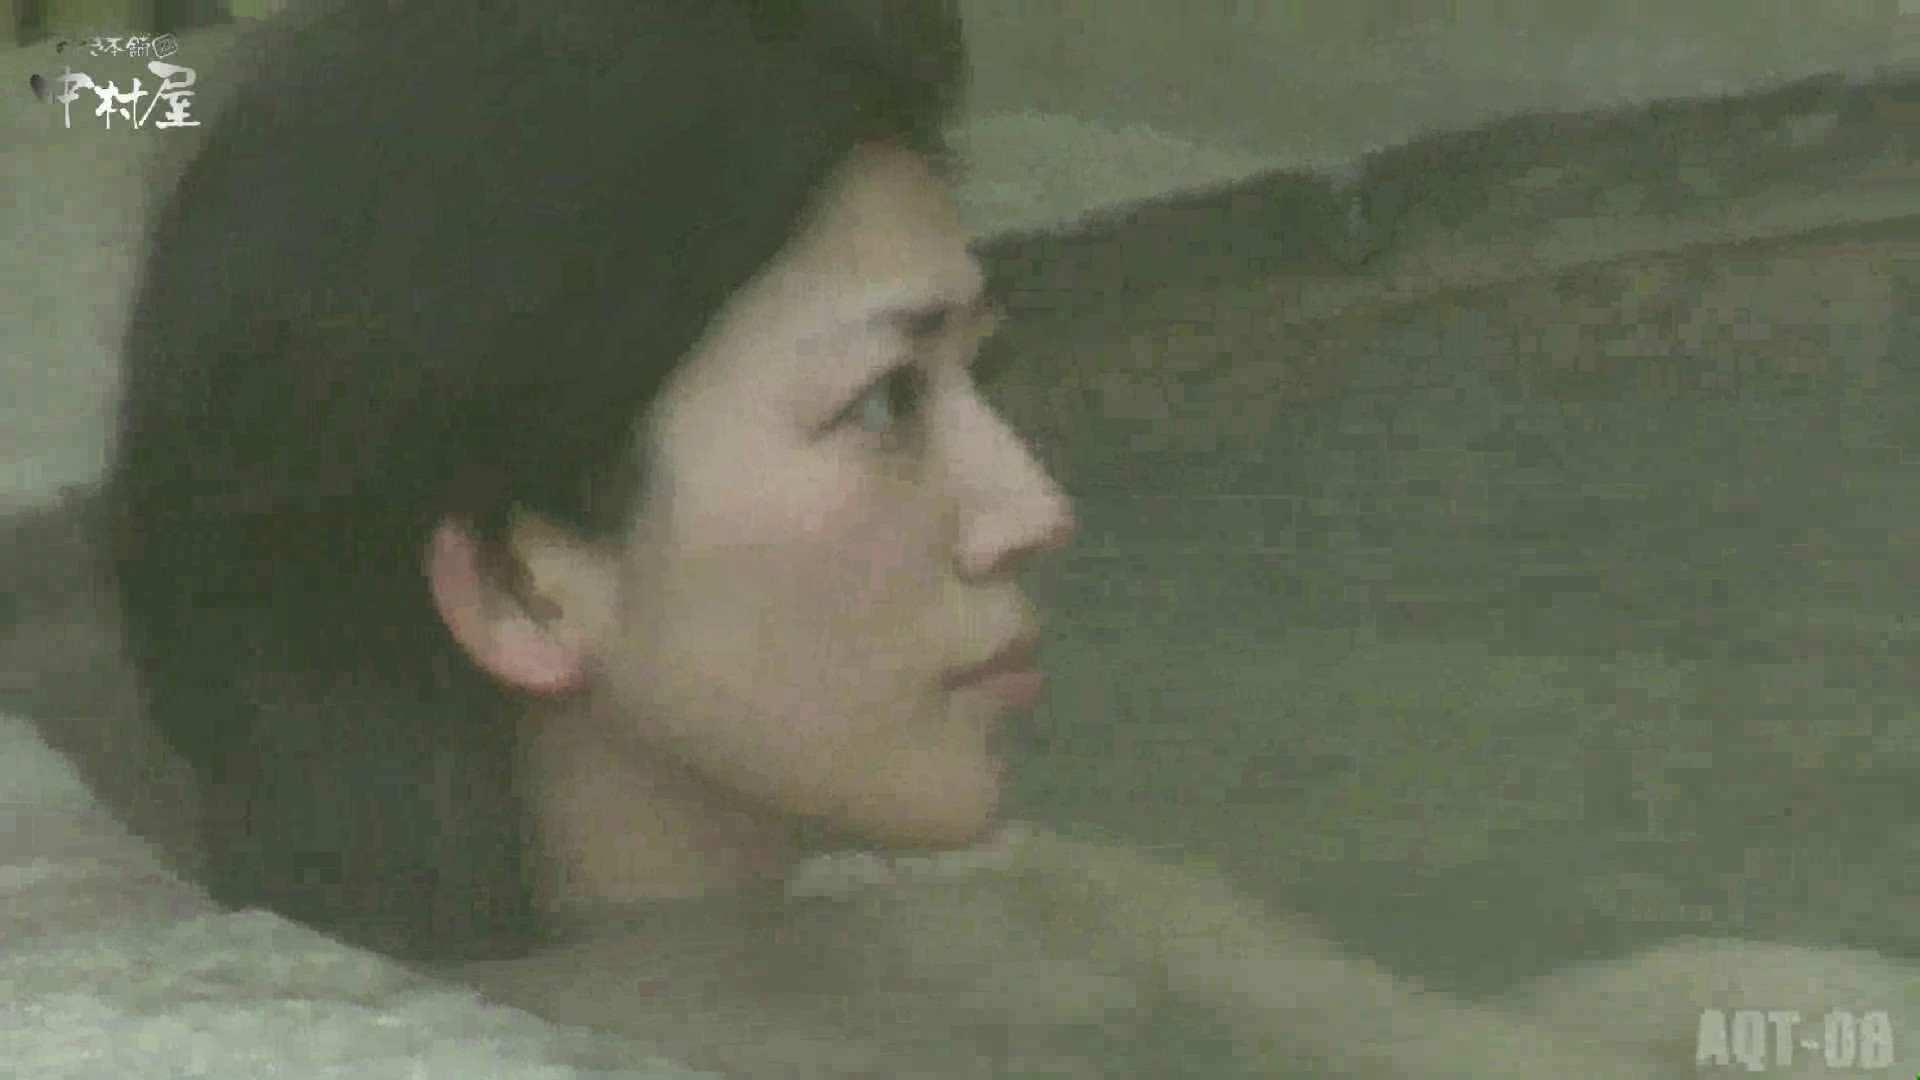 Aquaな露天風呂Vol.872潜入盗撮露天風呂八判湯 其の四 OL女体  92連発 56